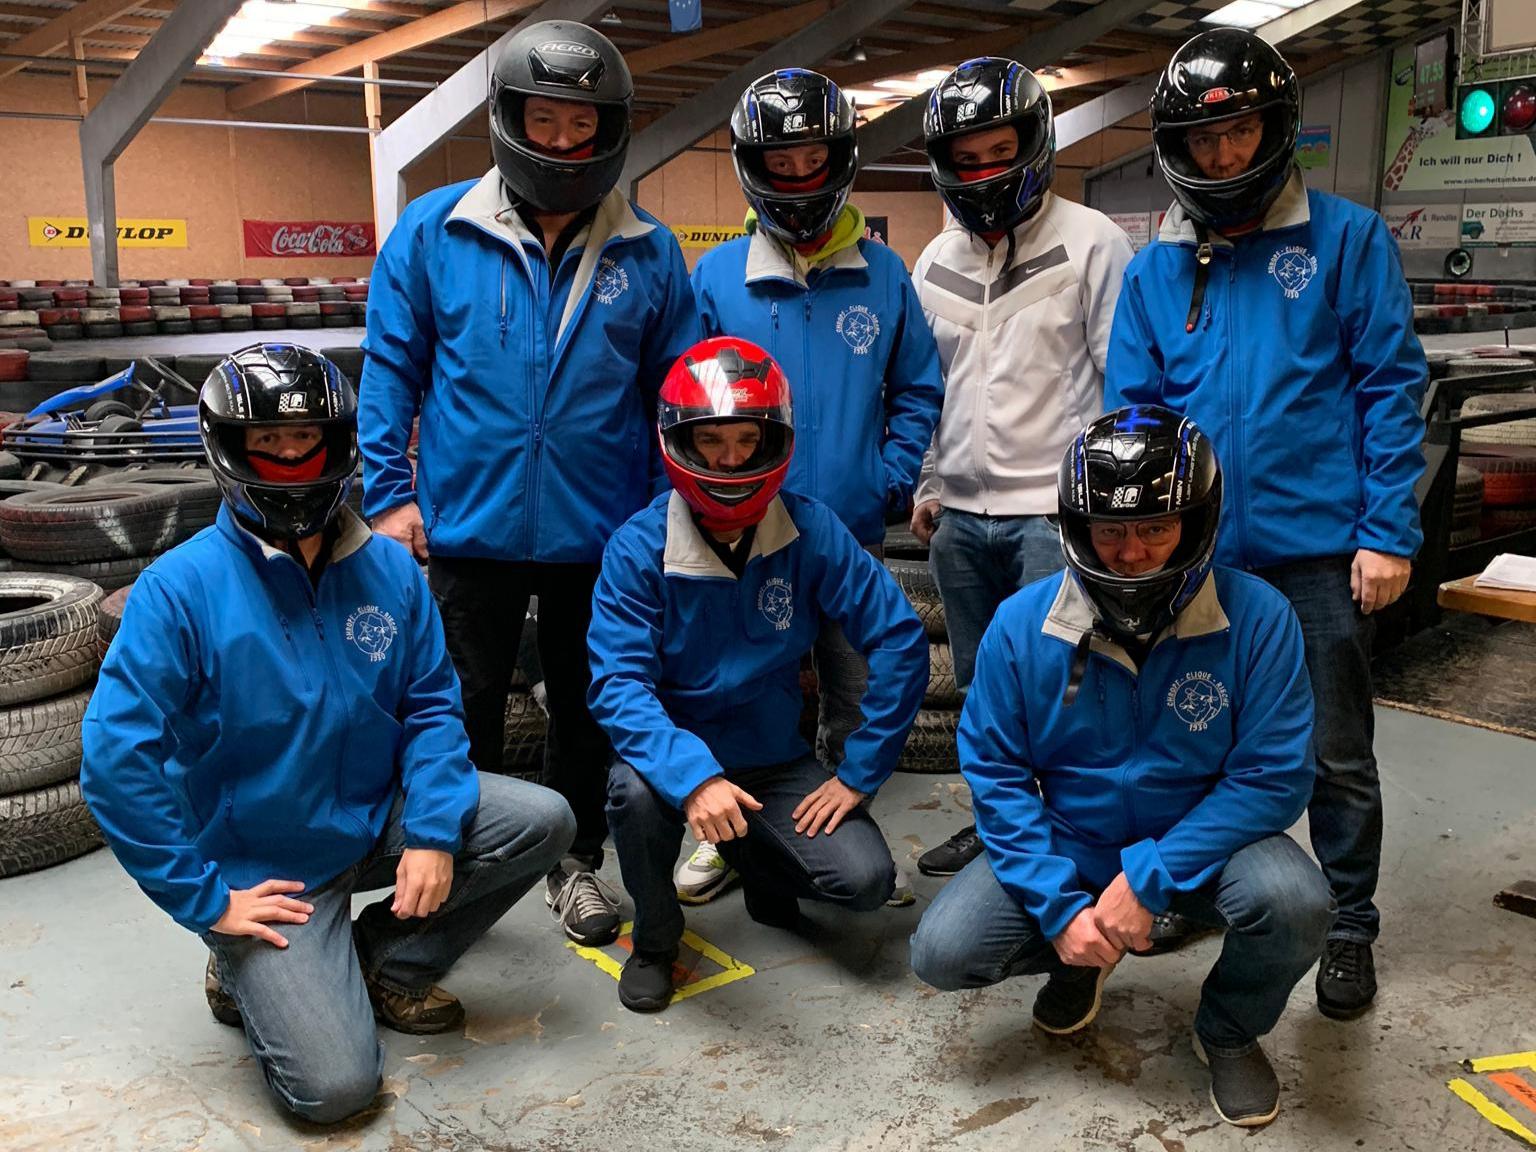 Chropf-Clique-Rieche, Bummel 2020 – Kartfahren